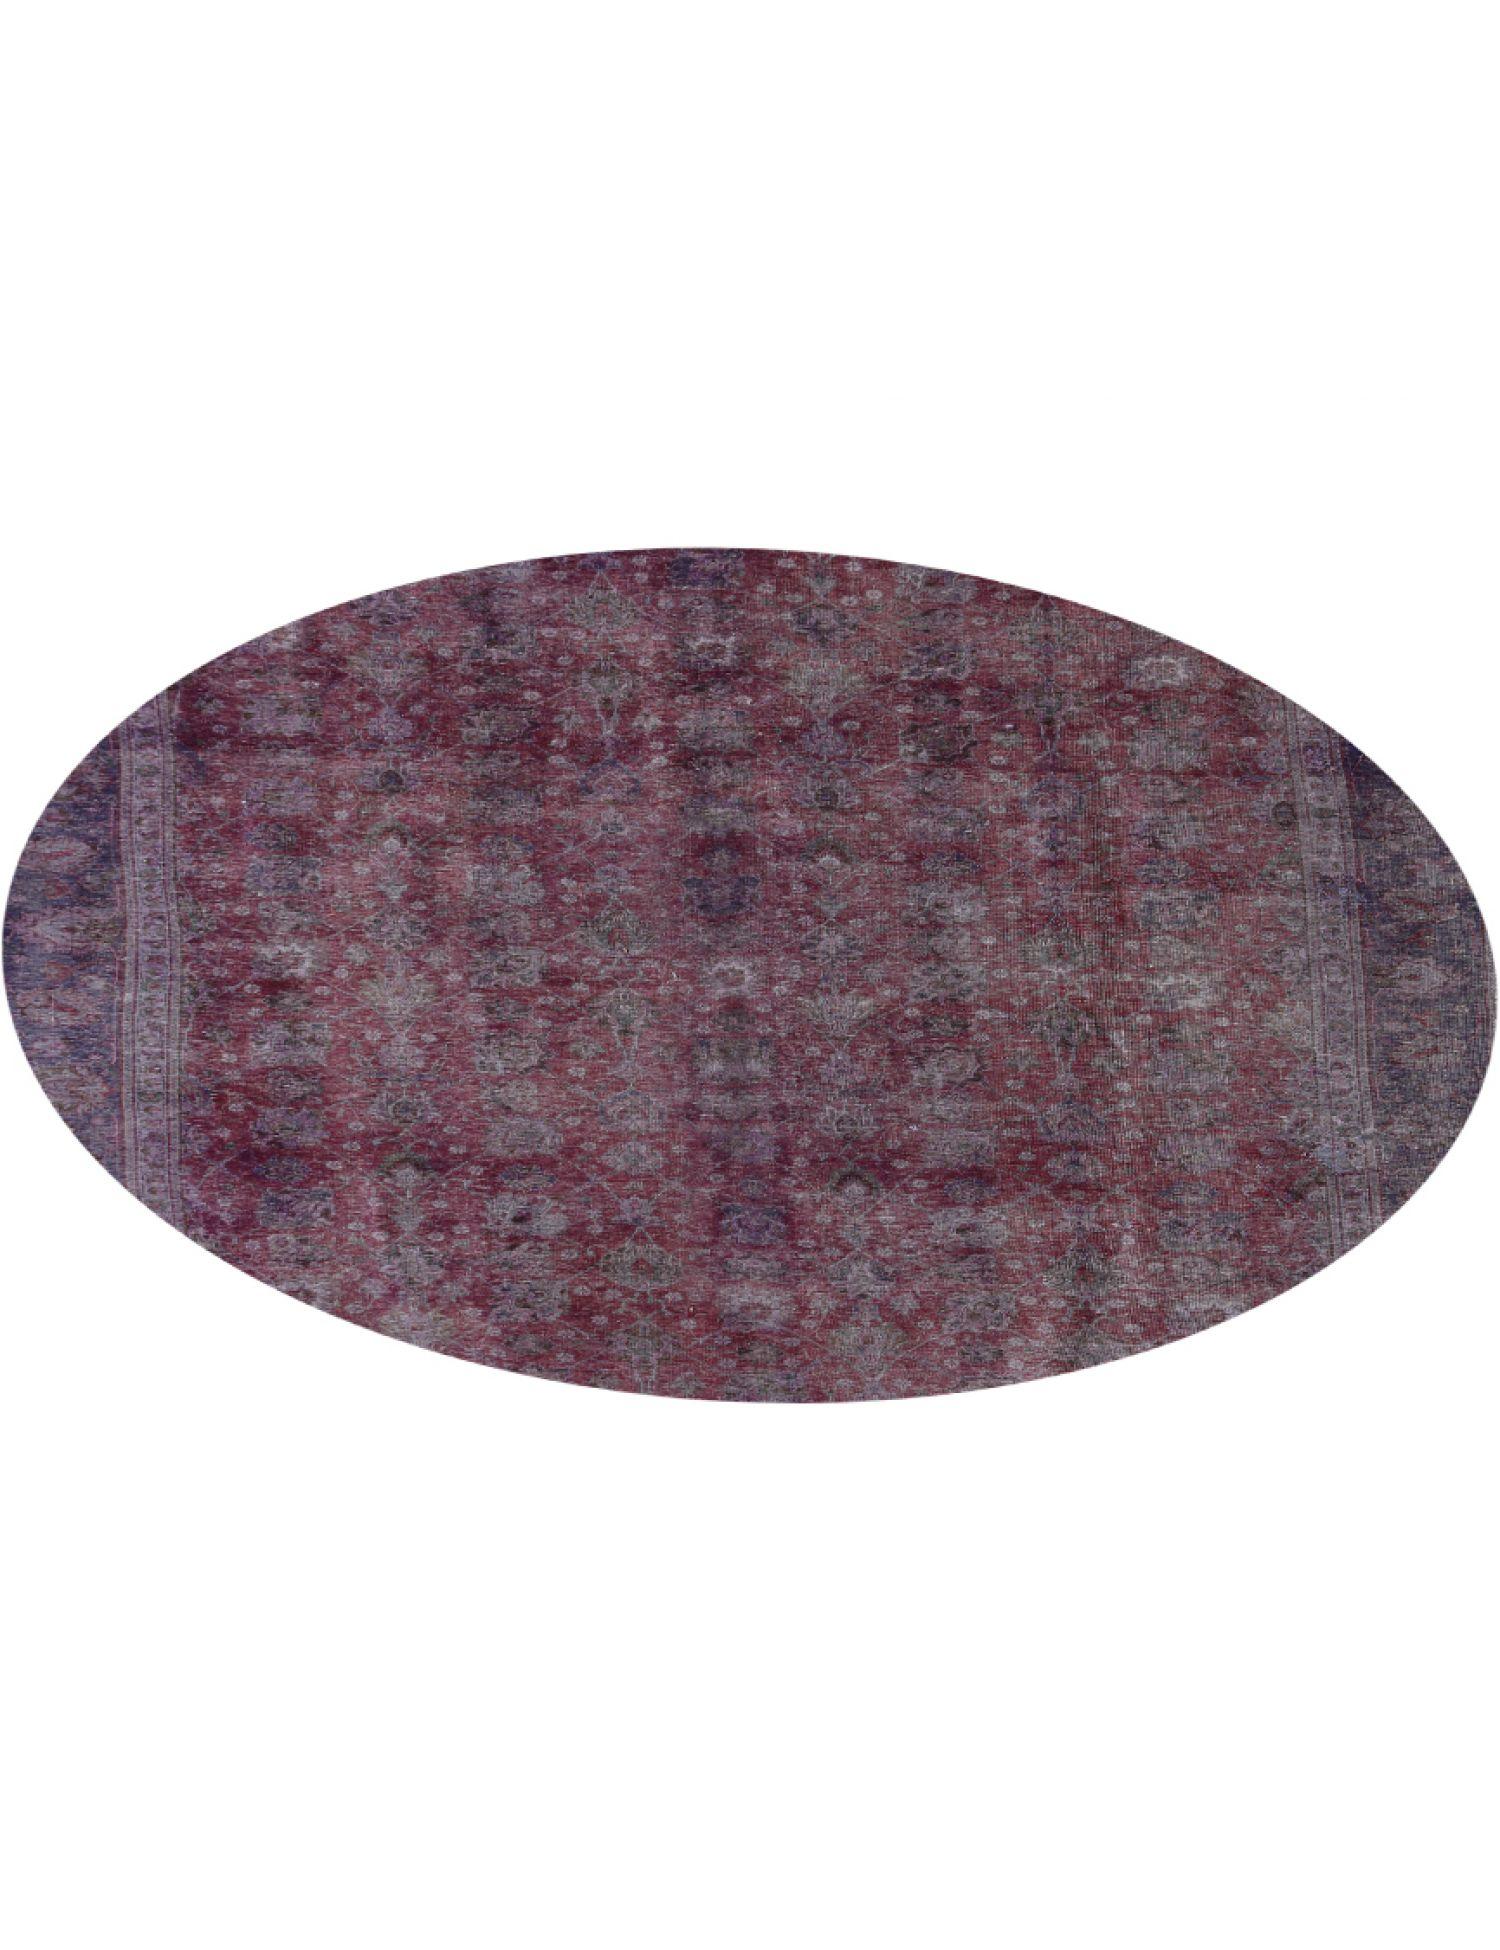 Tappeto Vintage  viola <br/>268 x 268 cm